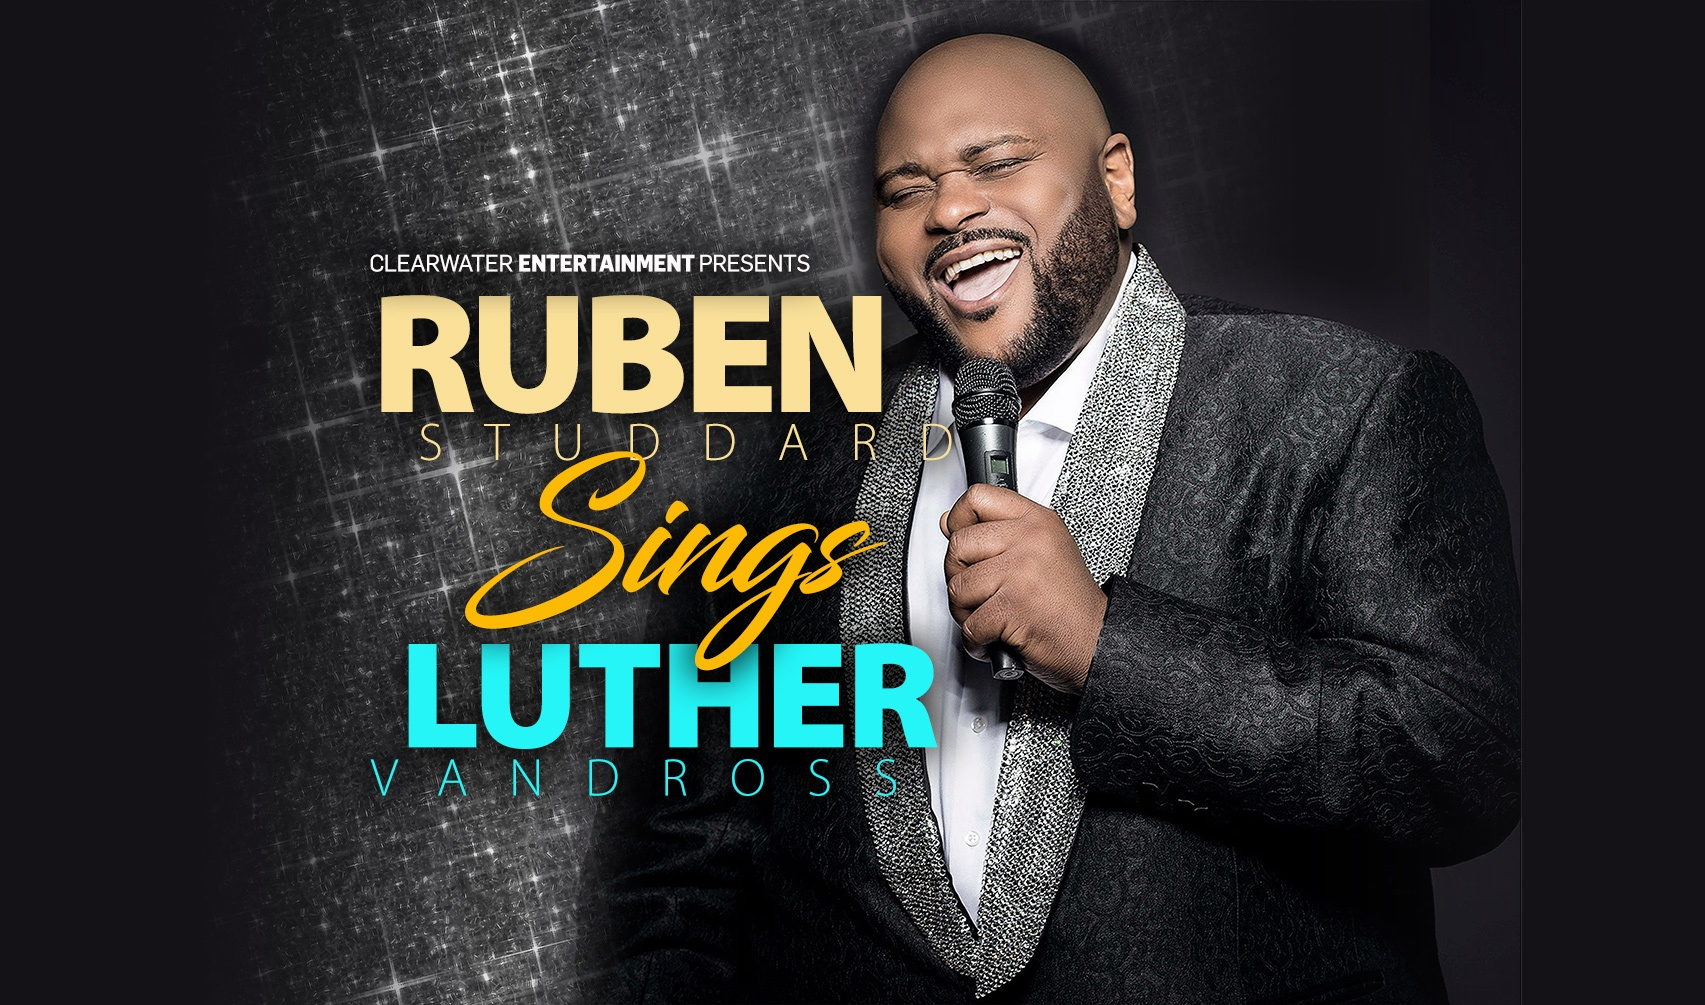 Ruben Sings Luther